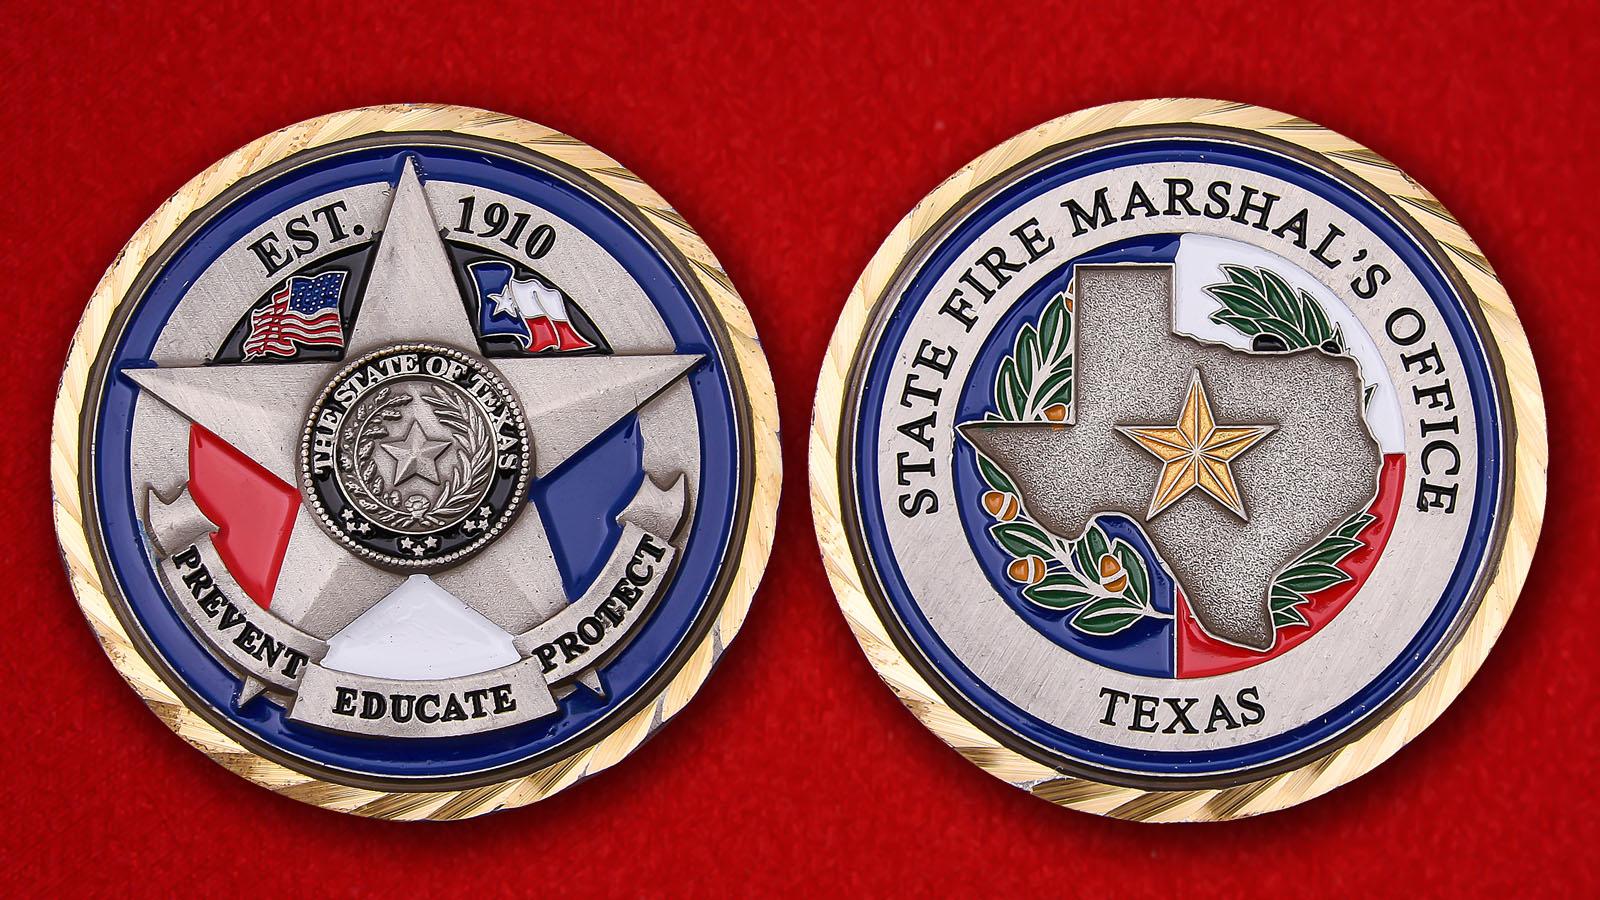 "Челлендж коин Челлендж коин Госпожарнадзора штата Техас штата Техас"" - аверс и реверс"